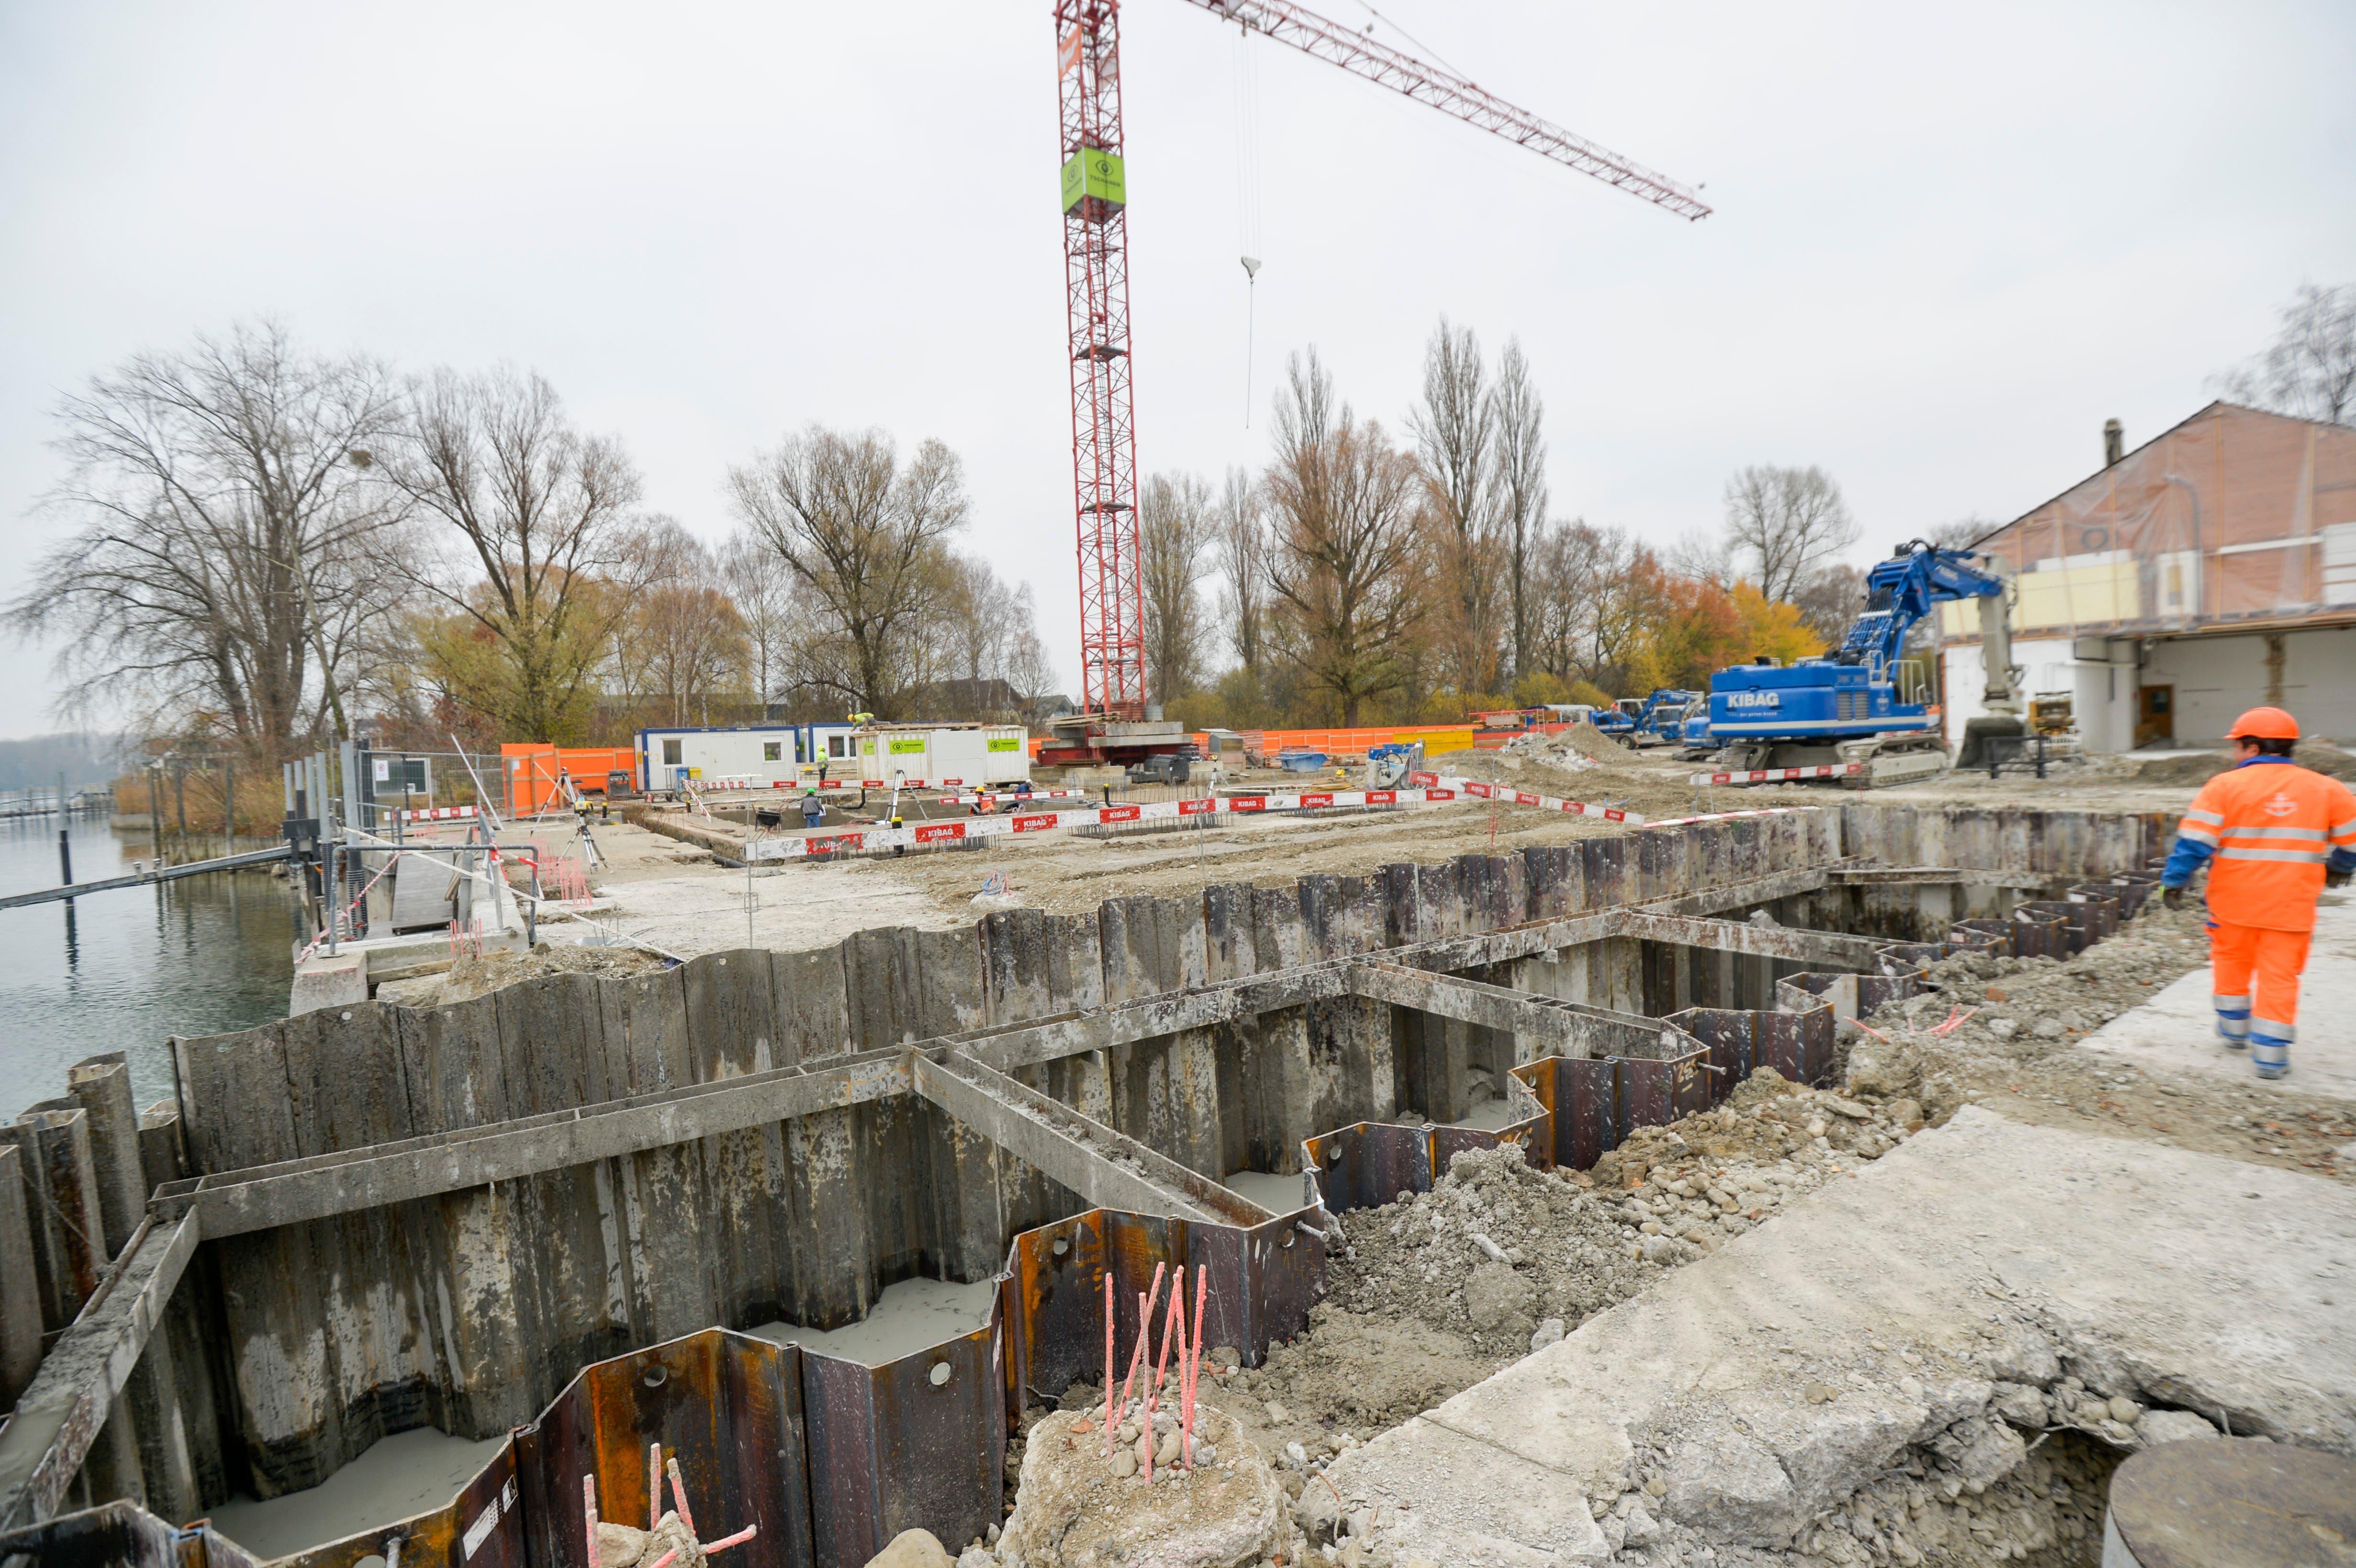 Blick auf die Baustelle. (Bild: Donato Caspari)